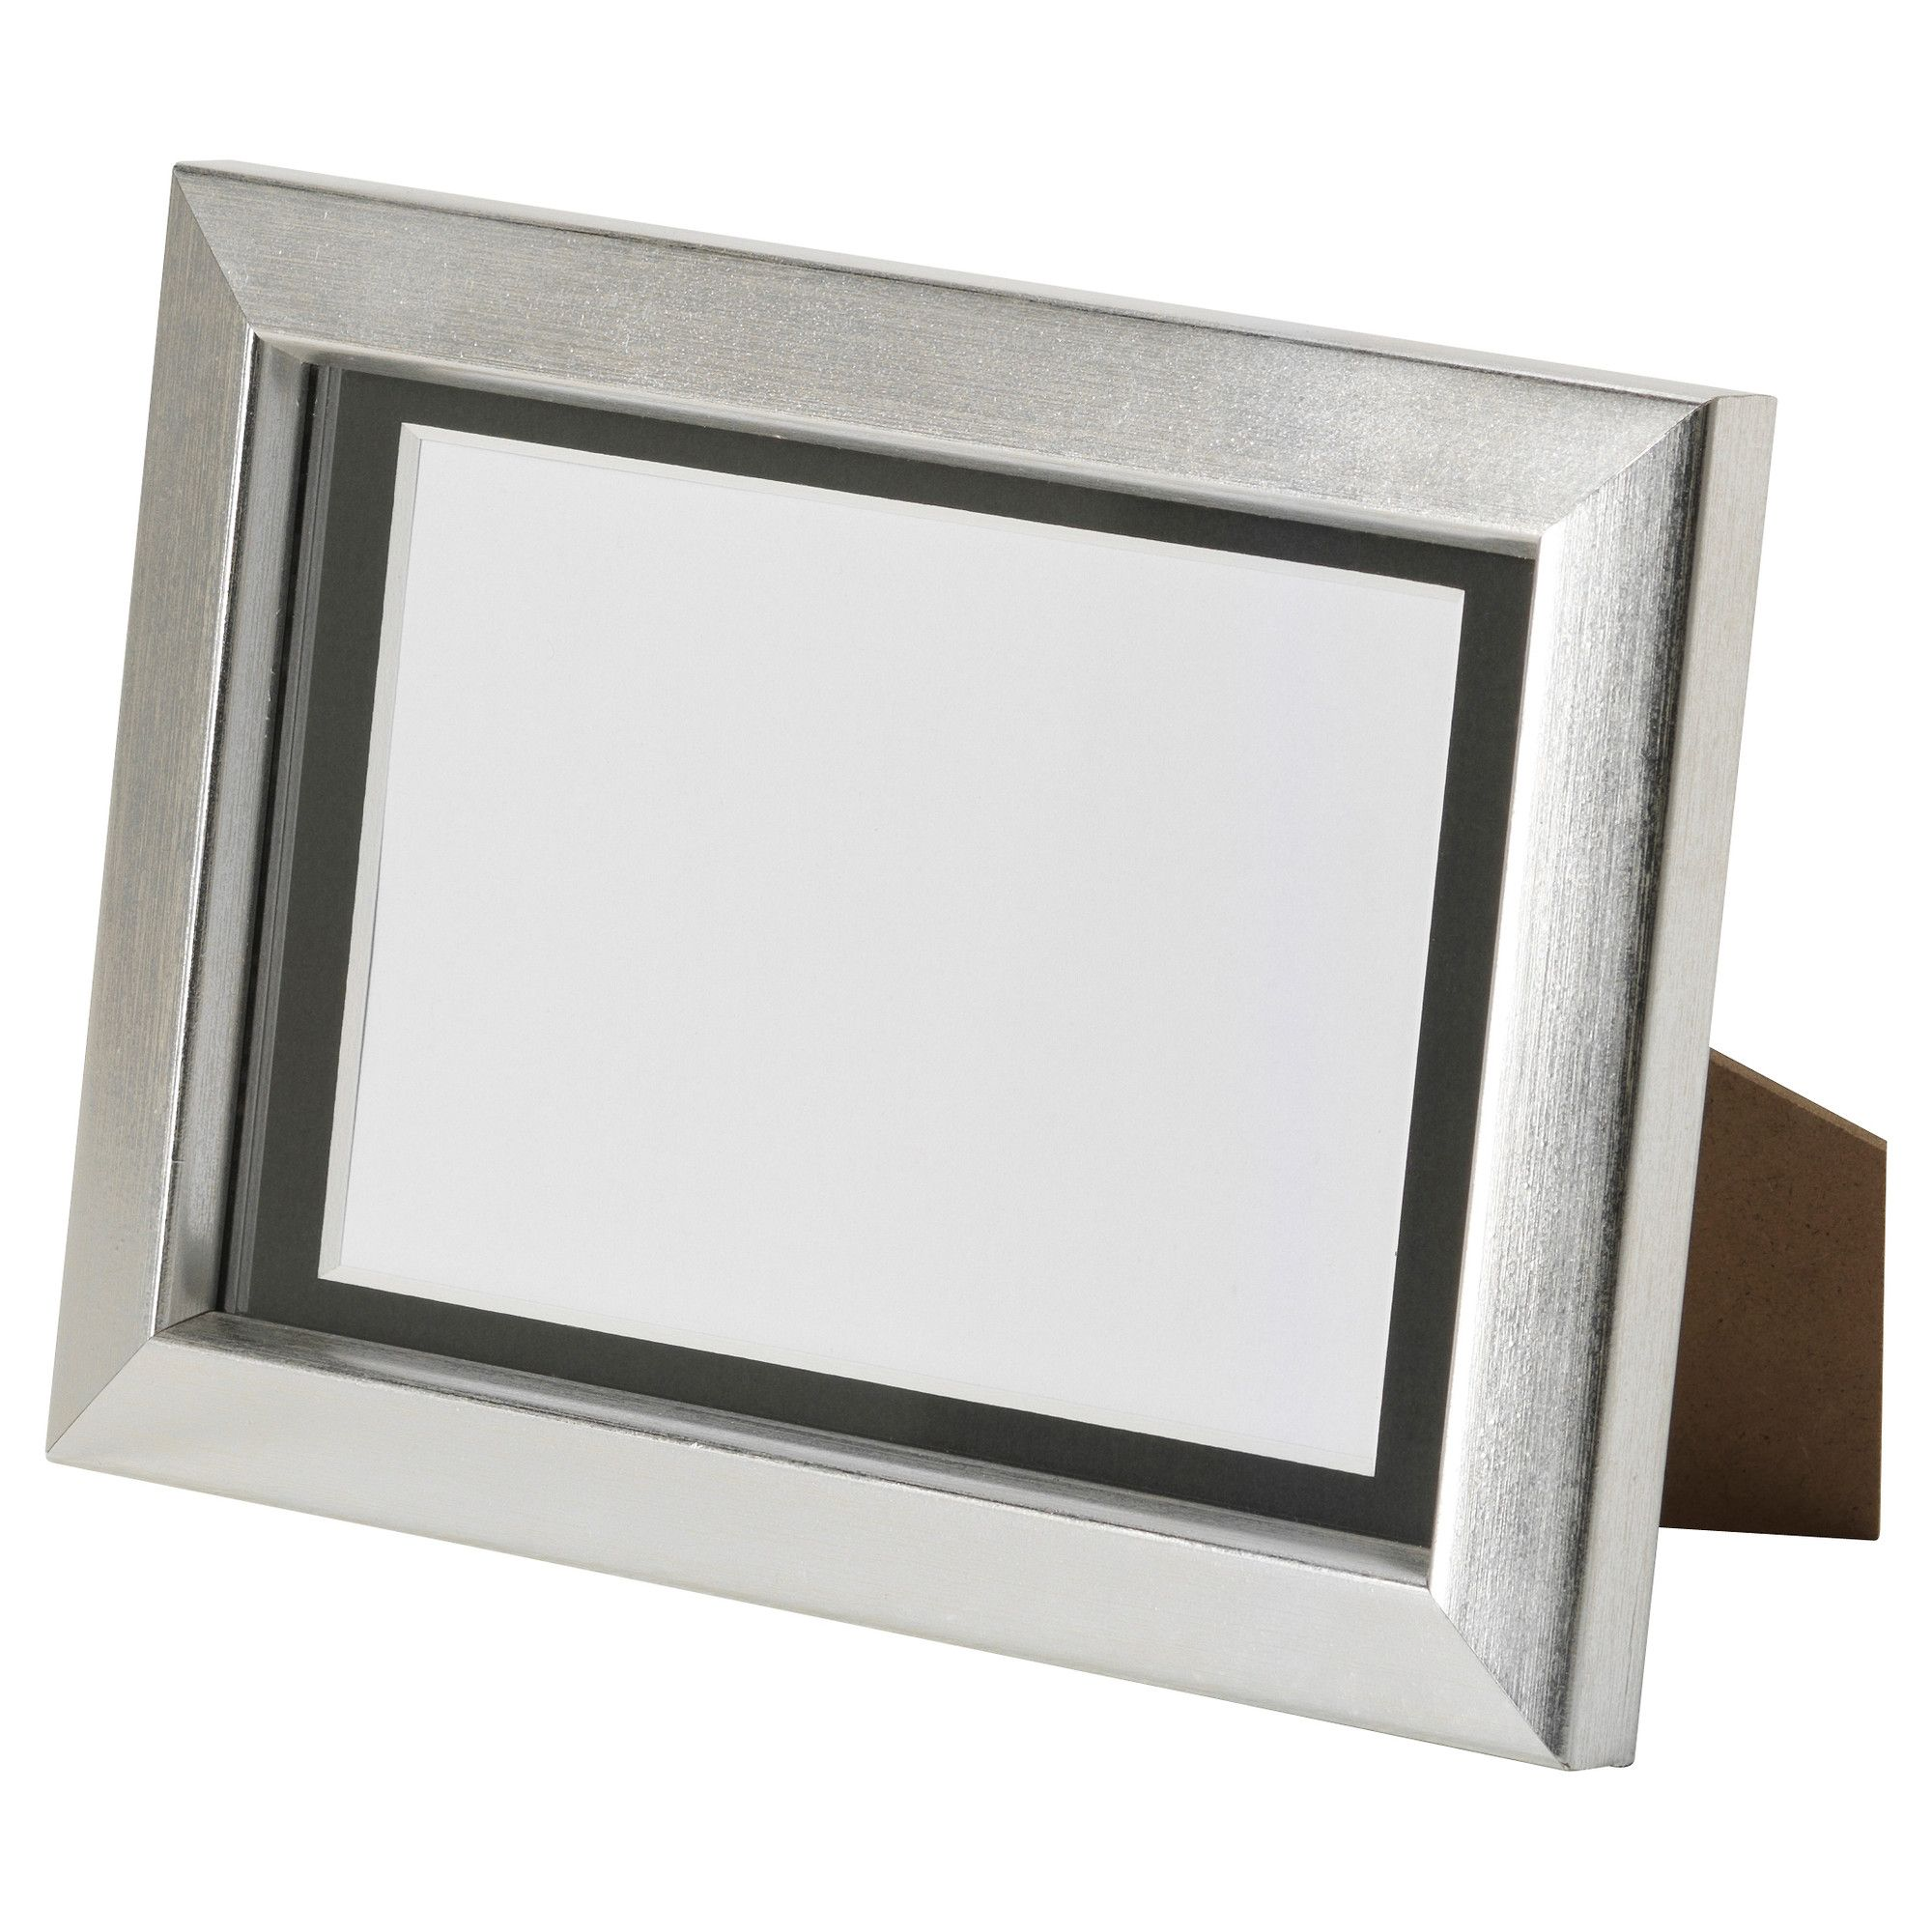 mahult frame 5x7 ikea decor ideas ikea picture. Black Bedroom Furniture Sets. Home Design Ideas